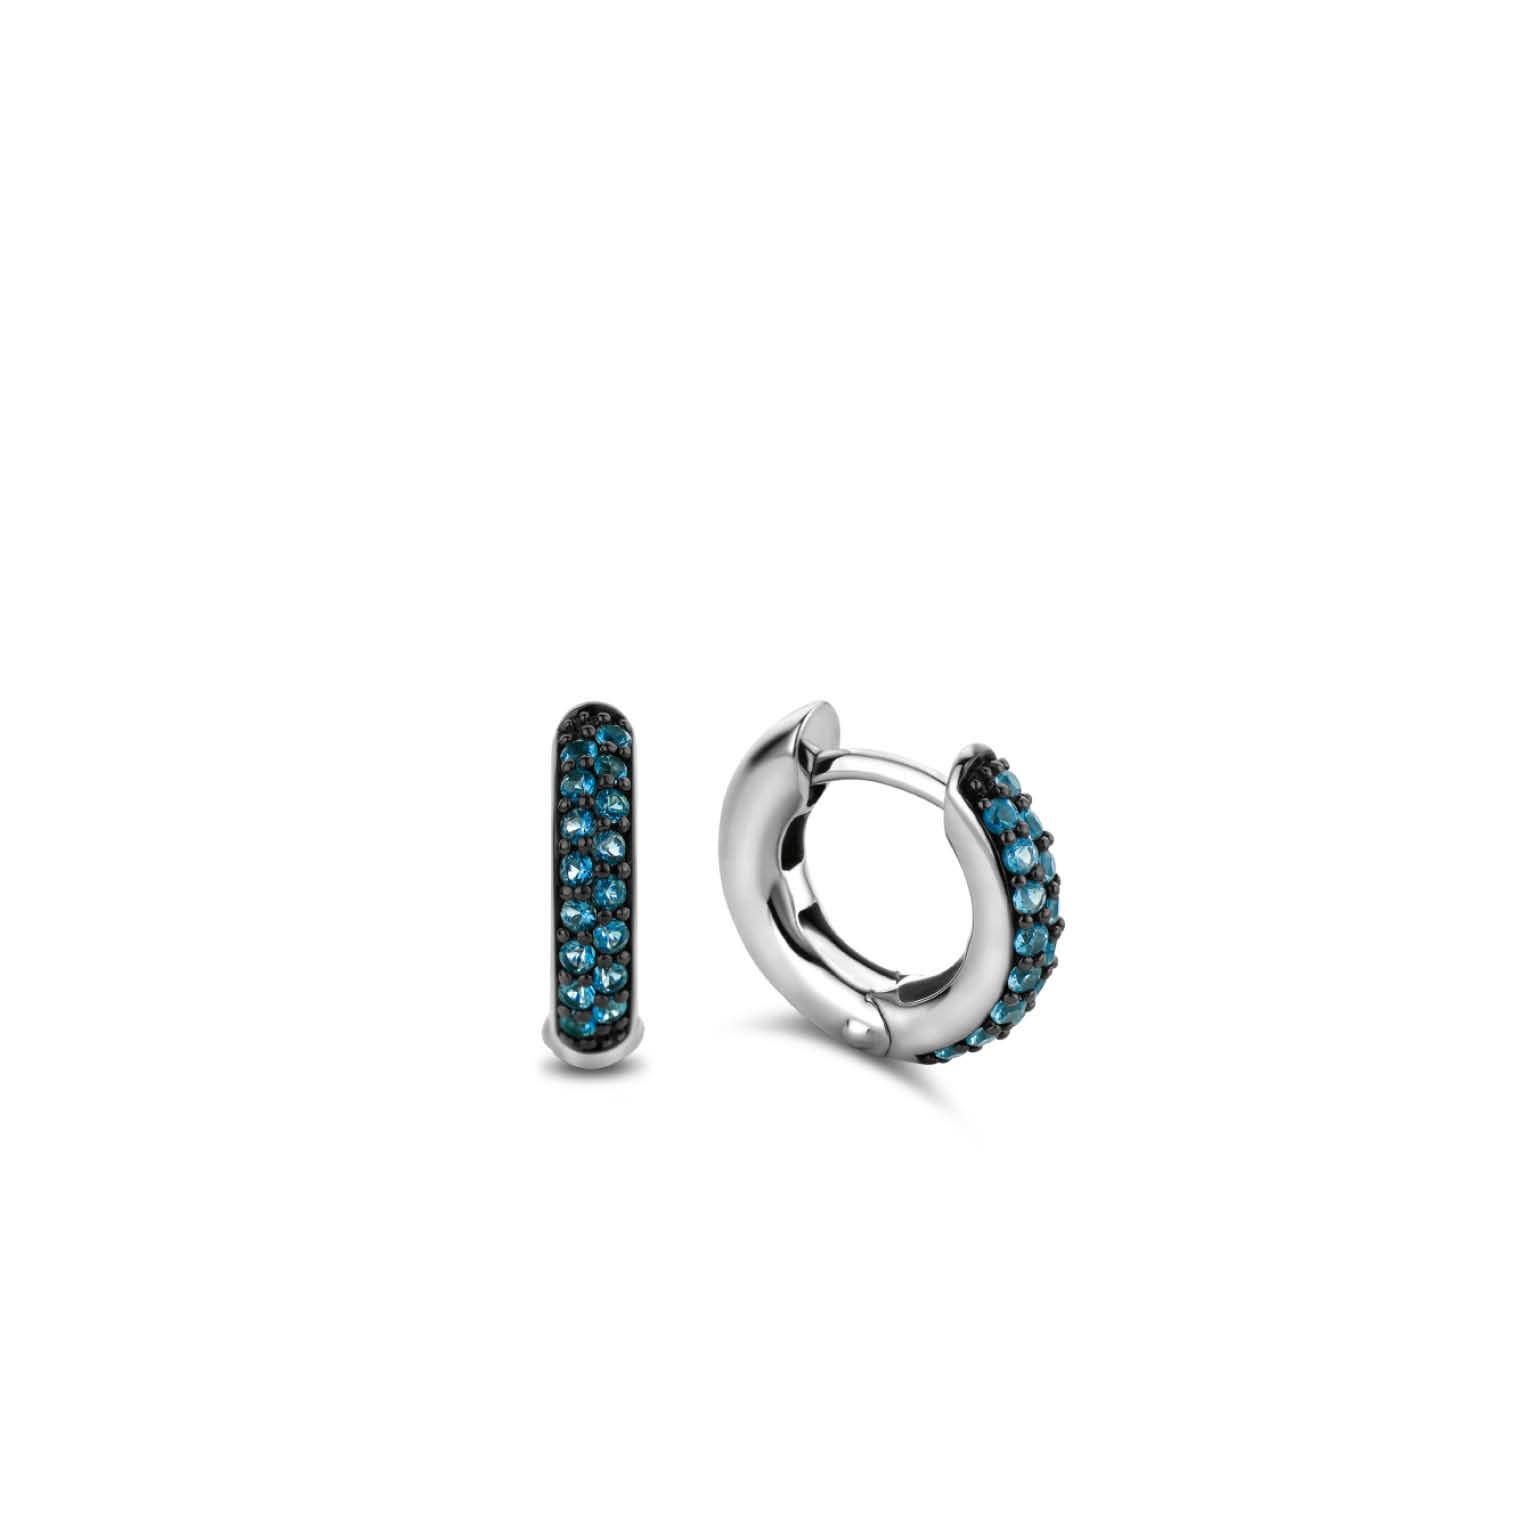 TI SENTO - Milano Earrings 7210DB-3